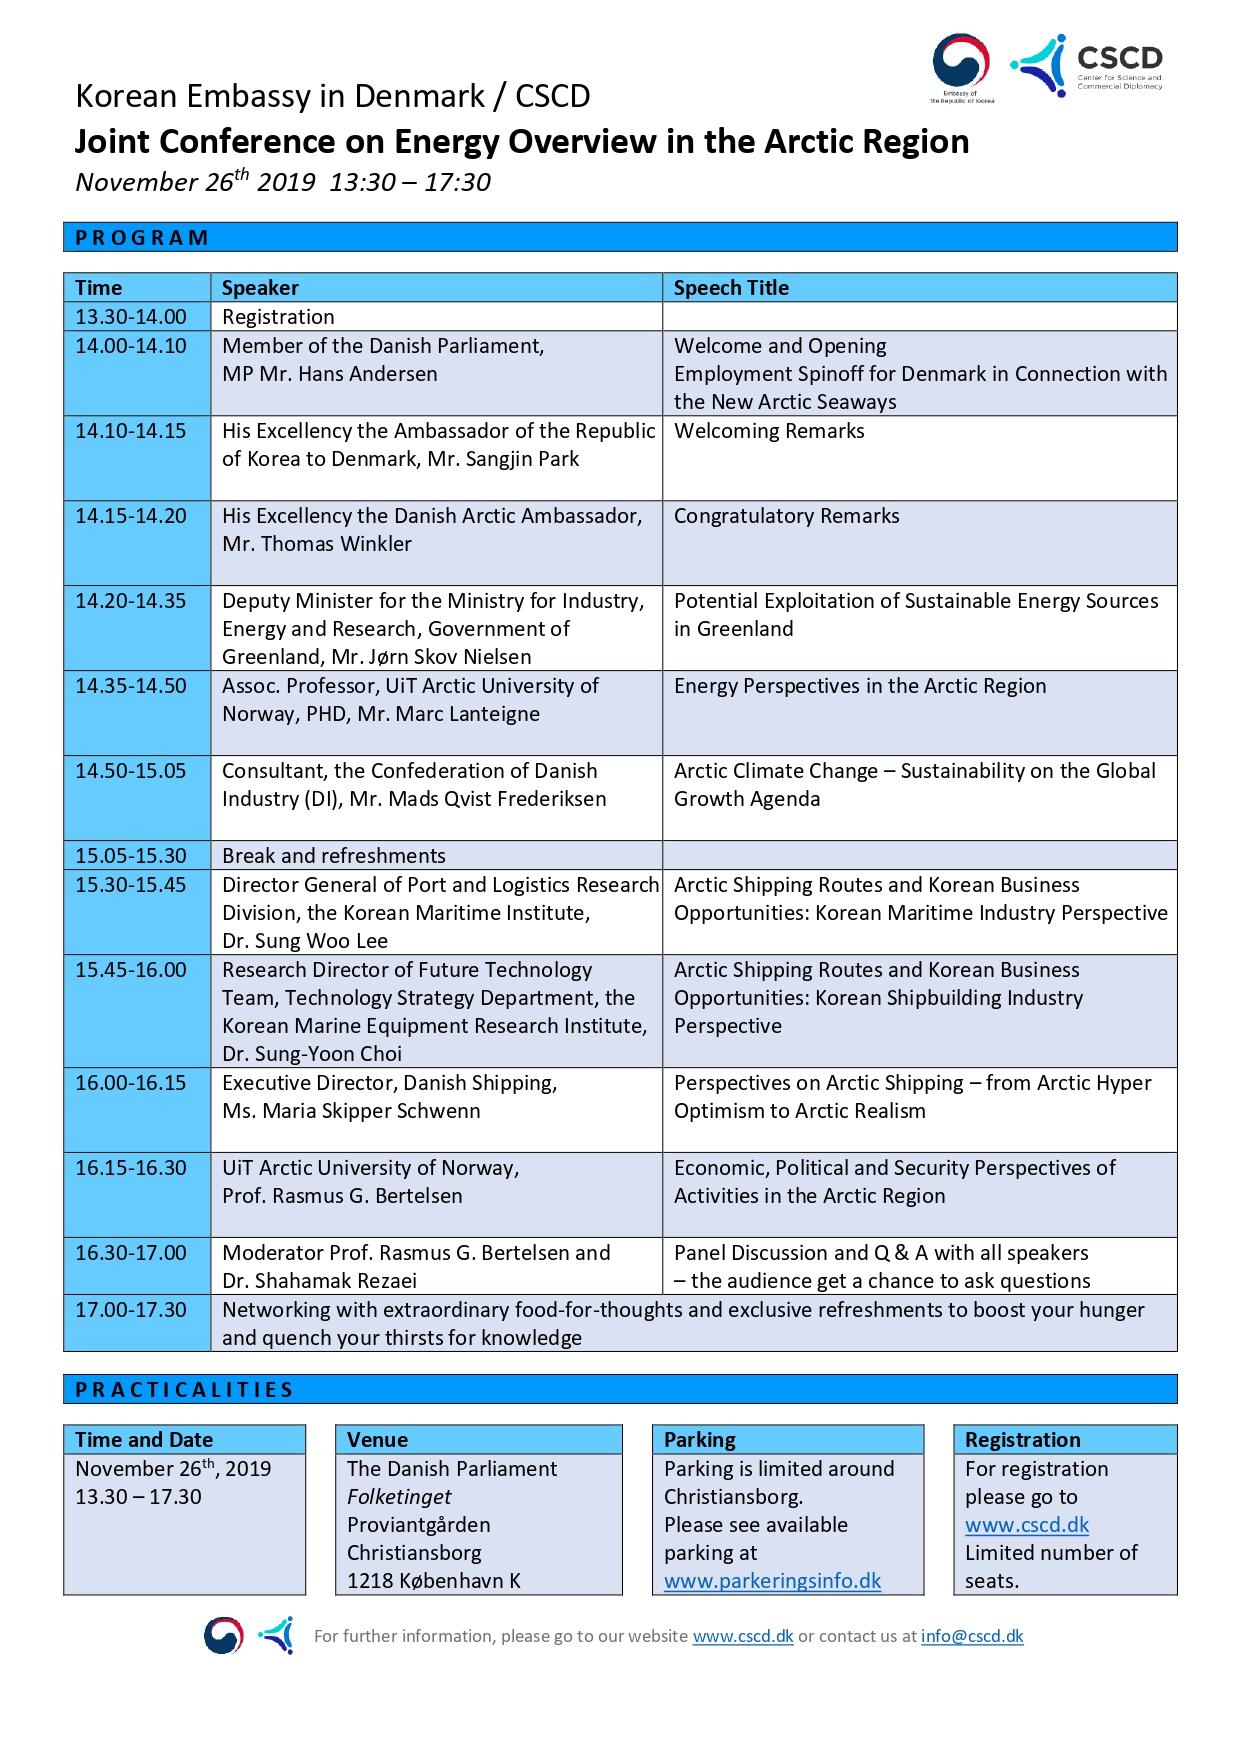 Program Energy Overview in the Arctic Region Nov 26